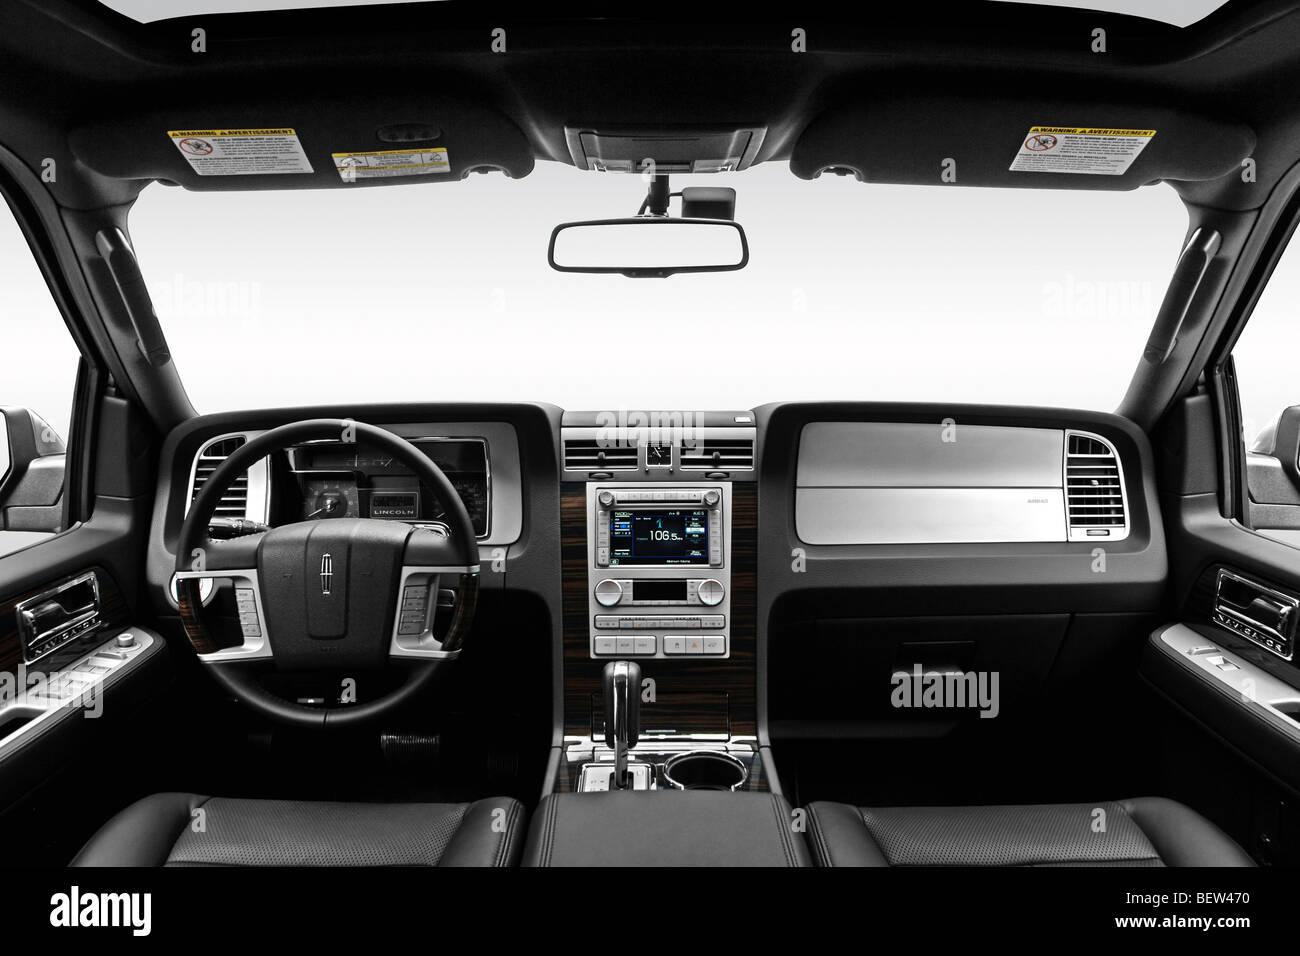 2010 lincoln navigator l in silver dashboard center console gear shifter view